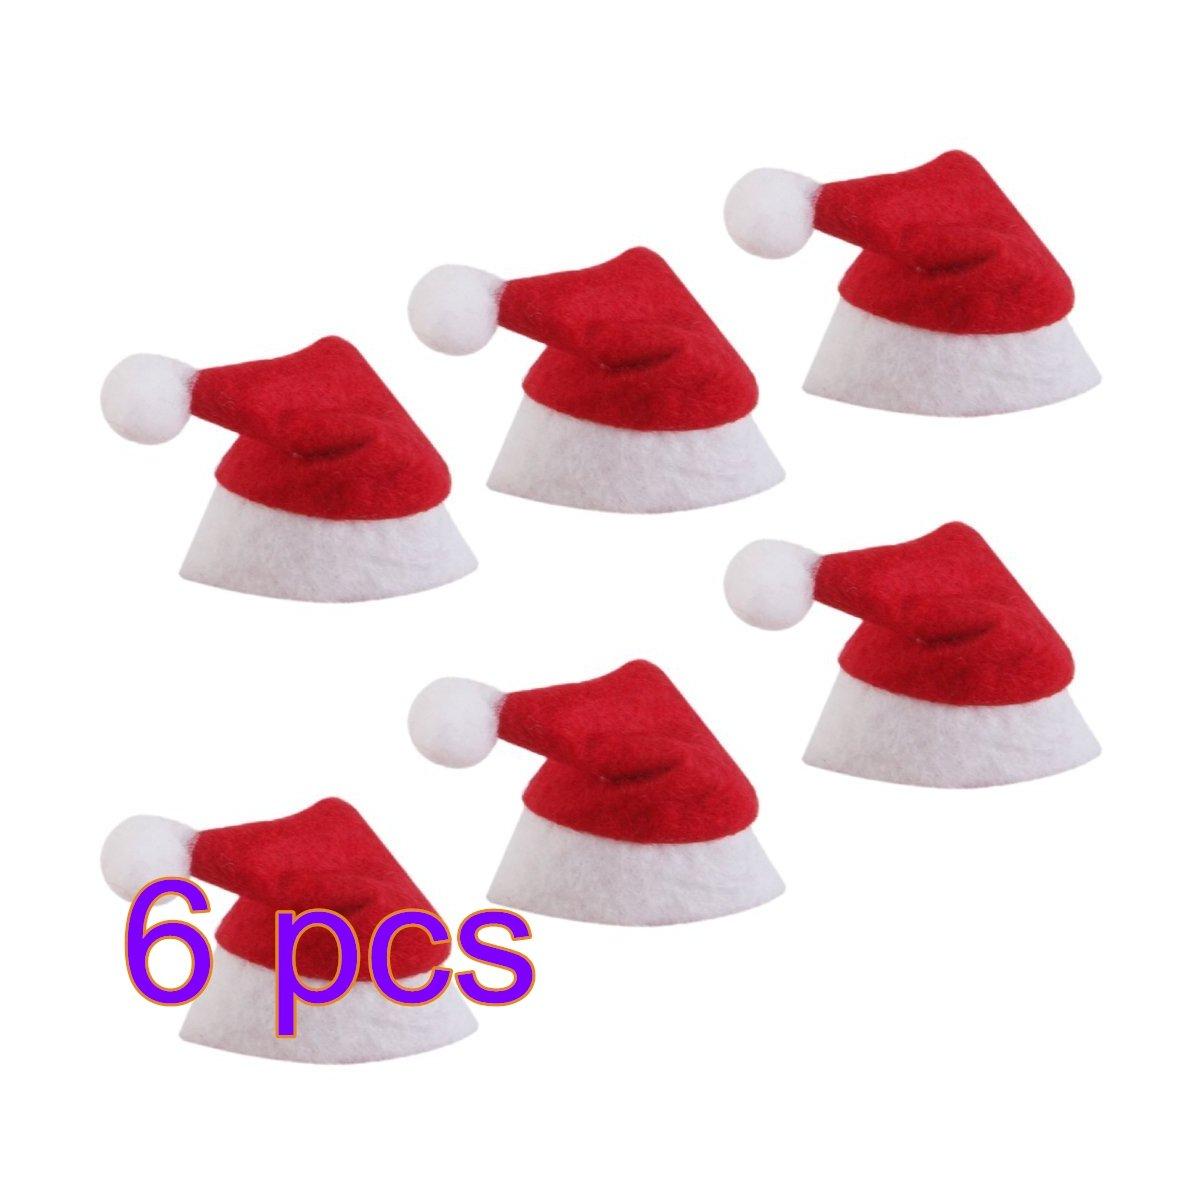 MOCHOAM Lotti da 6 pezzi Cappellini Mini Santa Cappelli decorativi per feste natalizie Lollipop